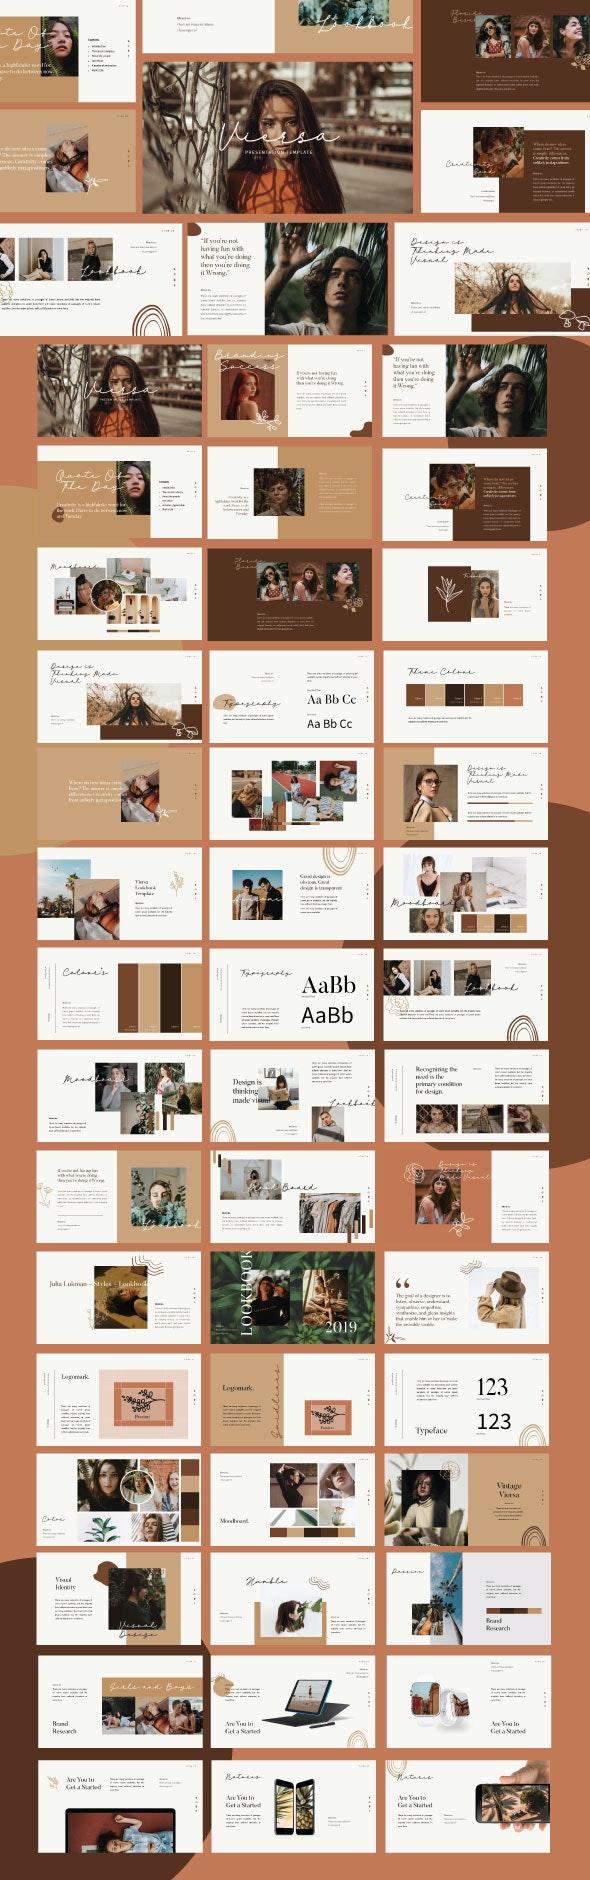 Viersa Brand Sheet Powerpoint - Creative PowerPoint Templates